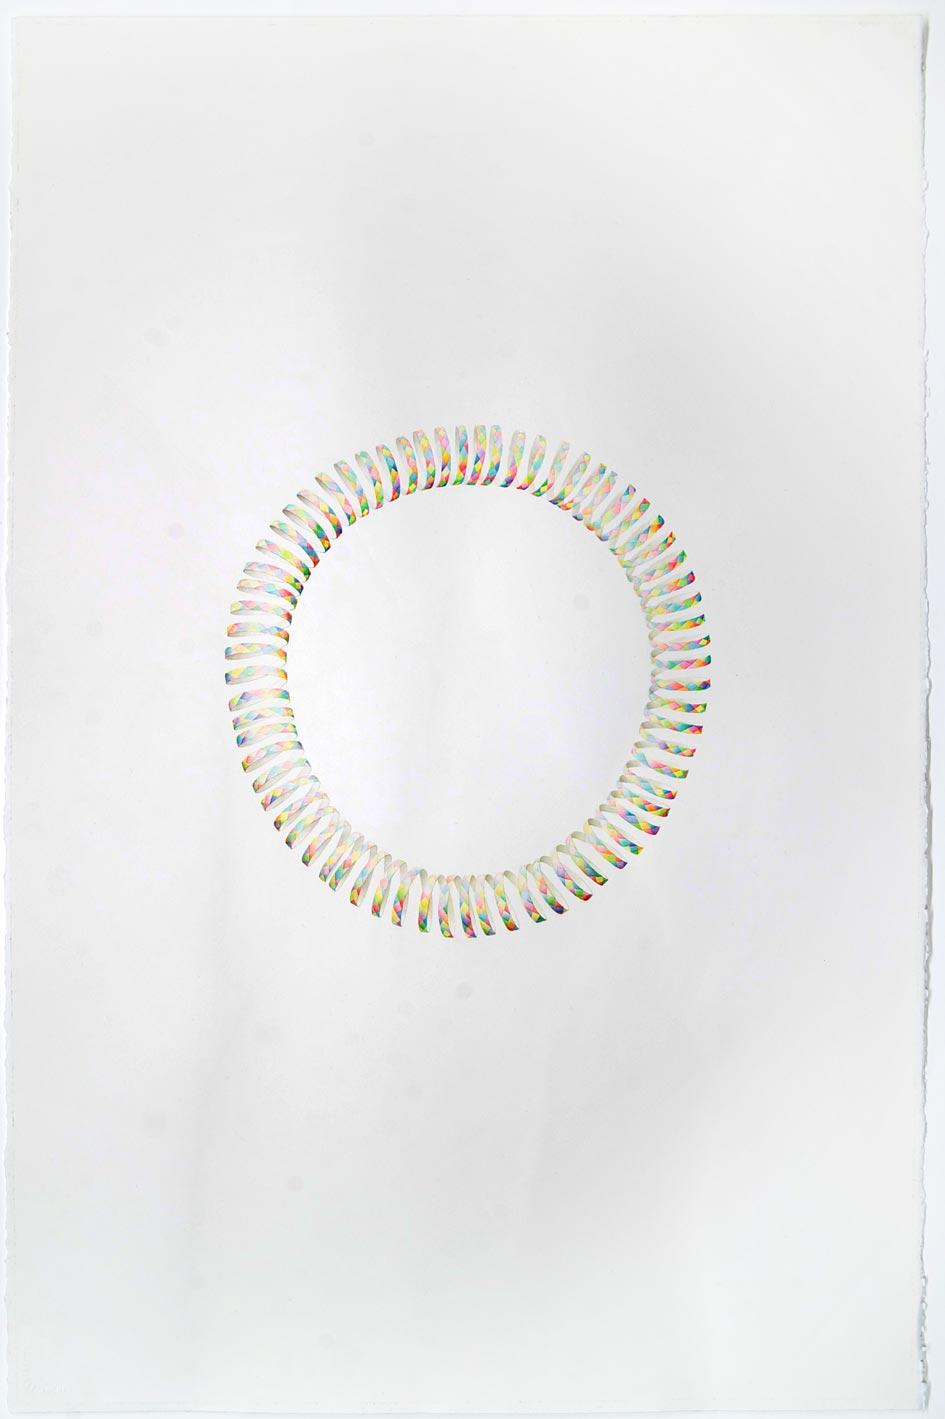 © LARS HINRICHS, UNTITLED (PARTY STREAMER_OUROBOROS), 2012, AQUARELLE, 101 X 76 CM